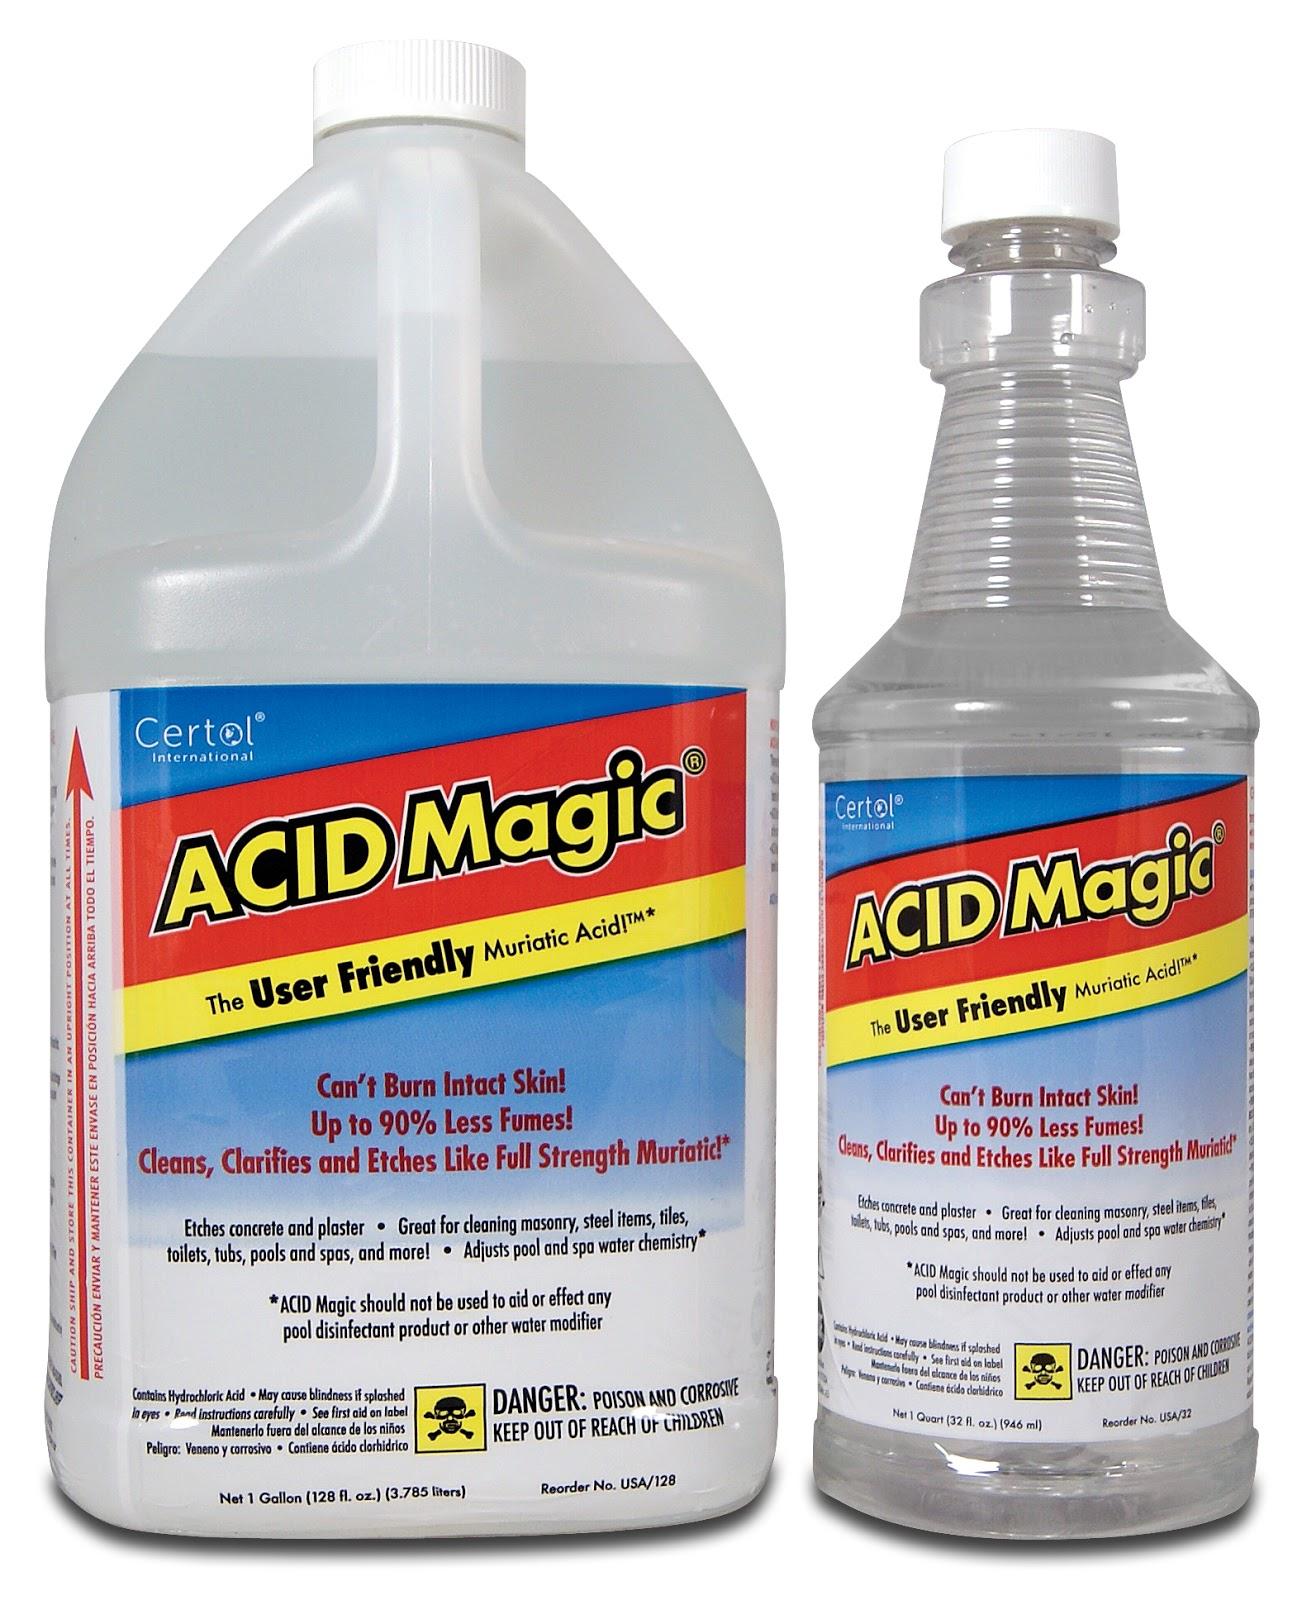 Certol International Acid Magic Believe The Hype